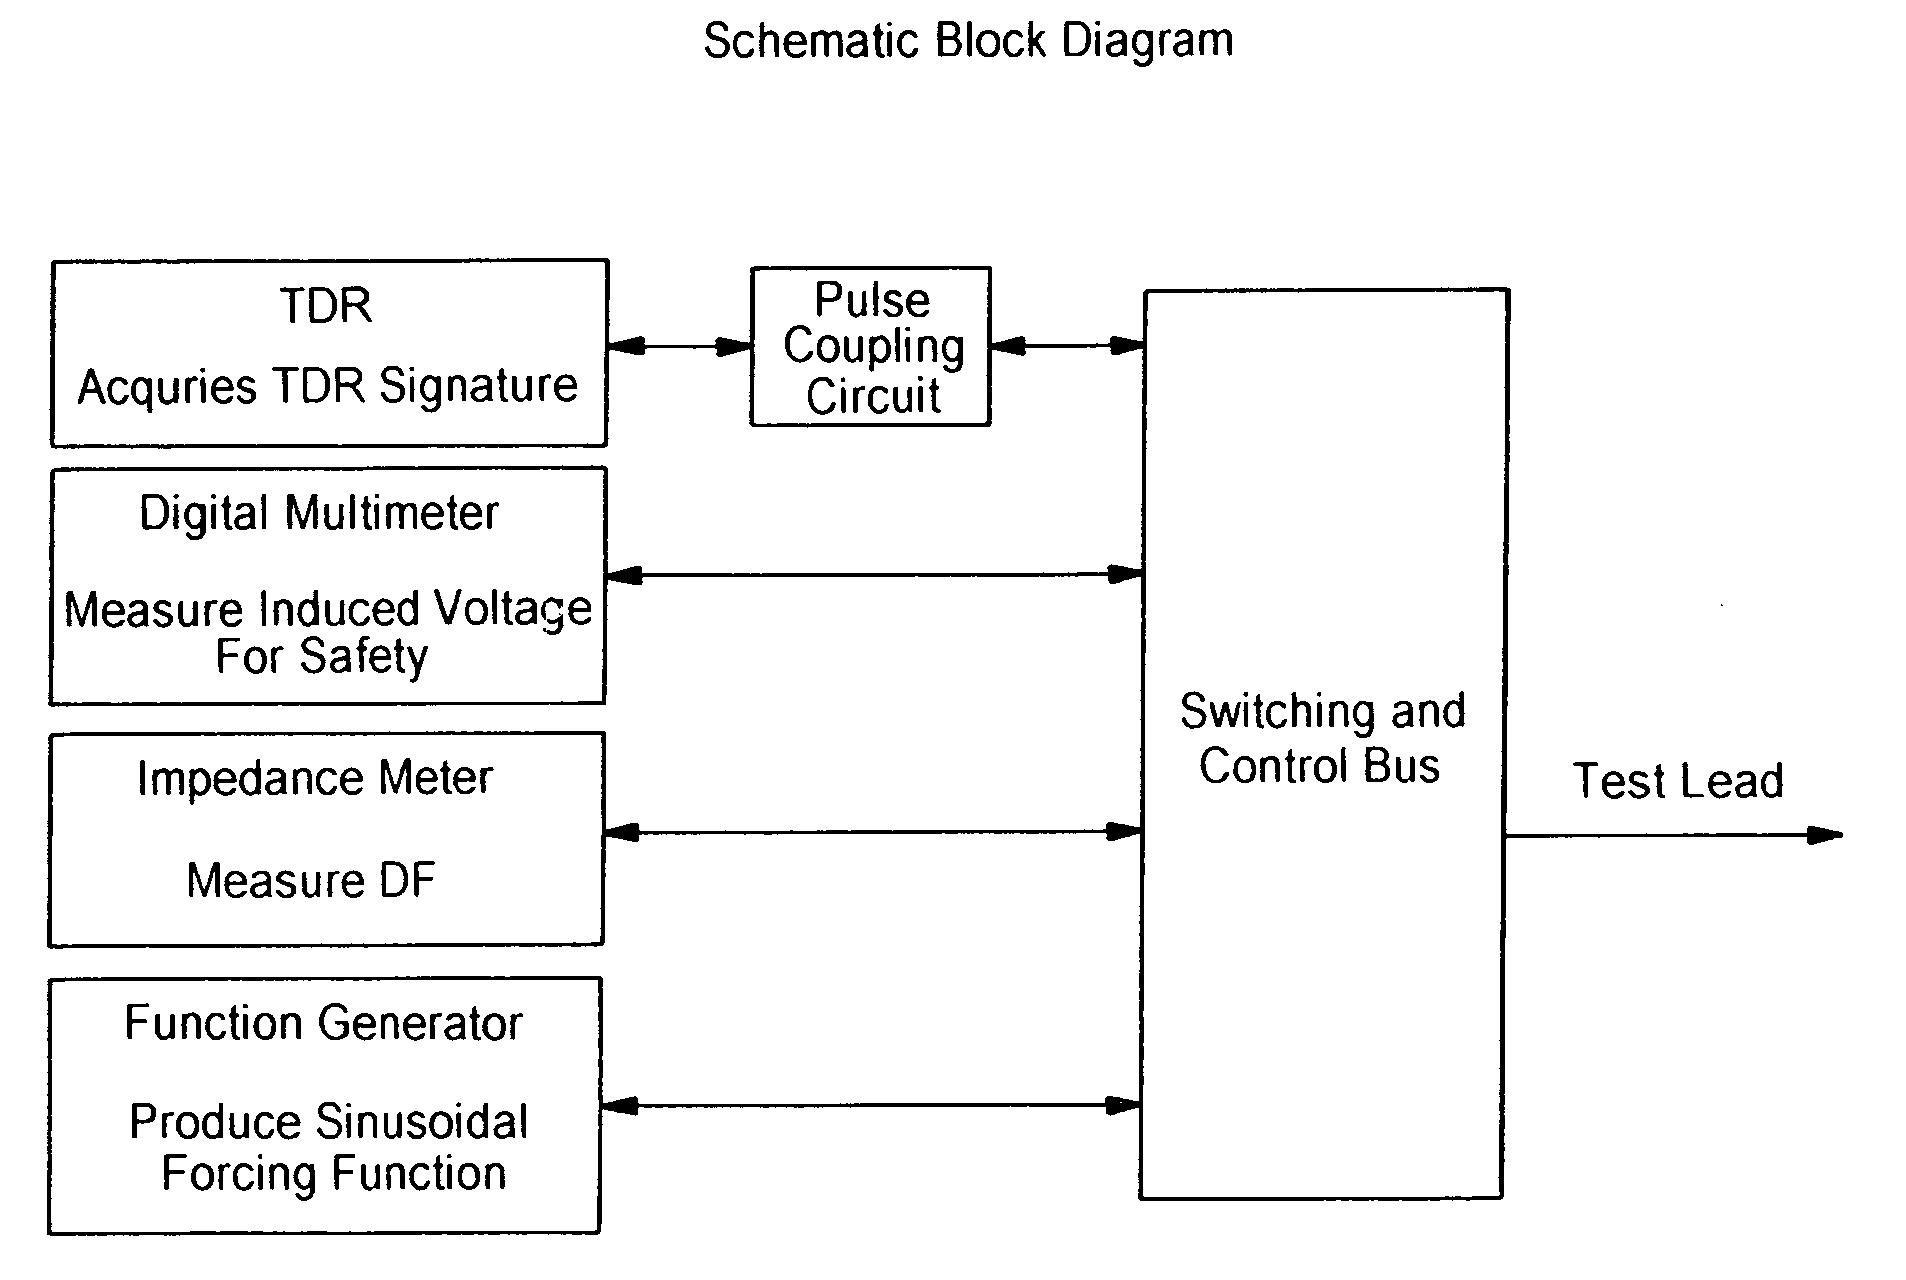 Patent Us20040183544 Method And Apparatus For Monitoring Integrity Function Generator Block Diagram Drawing